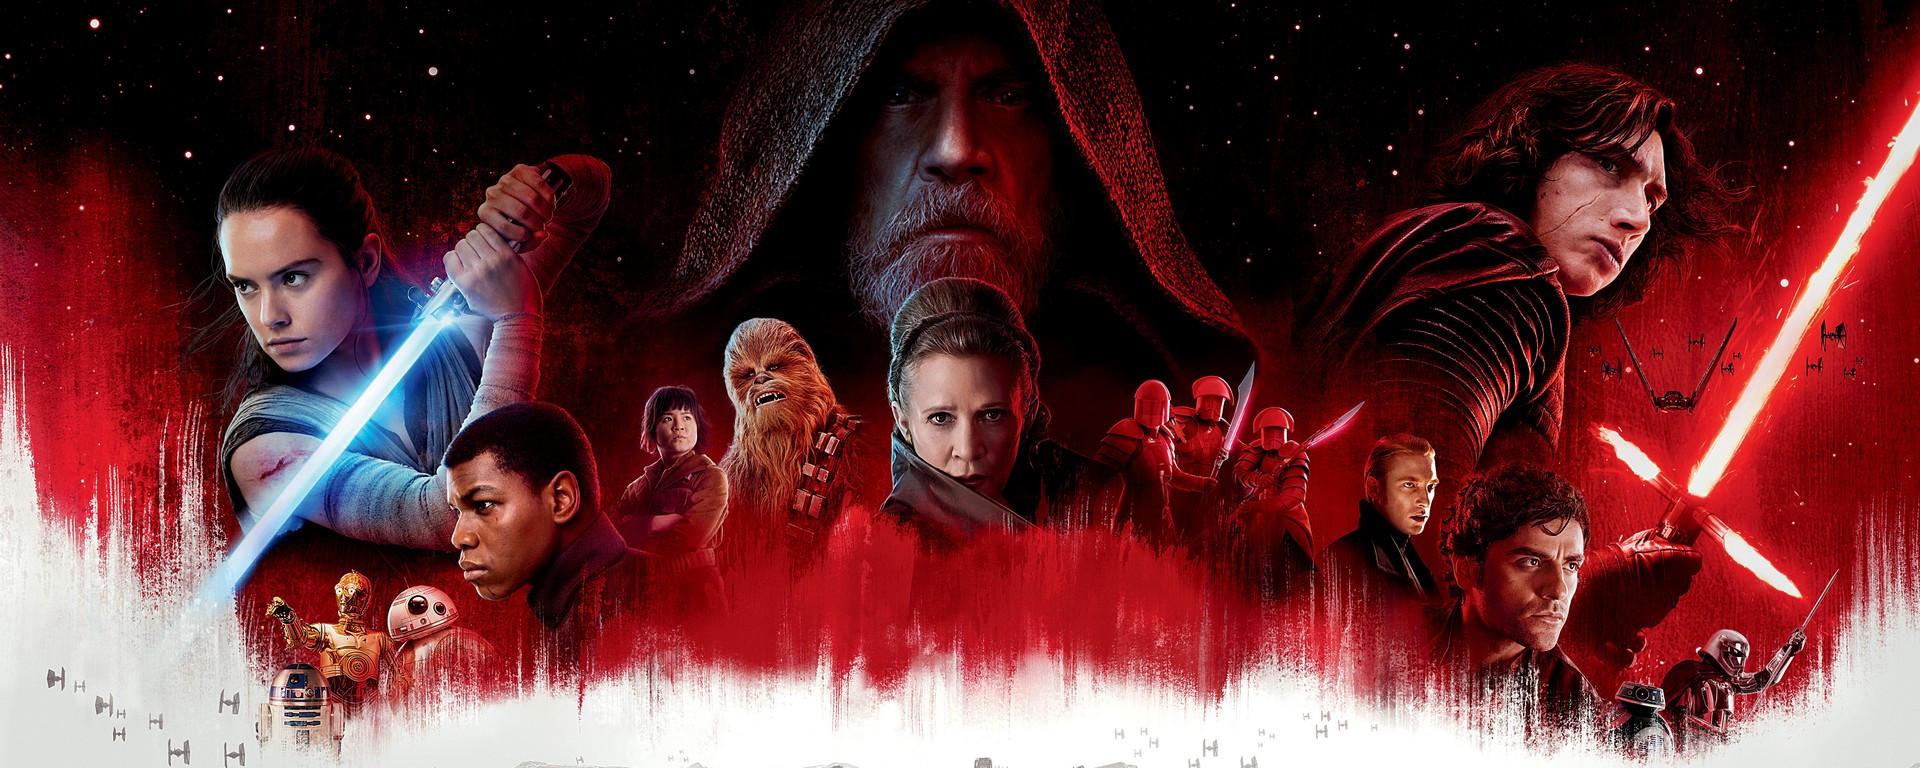 Star Wars Episode VIII, les derniers Jedi.